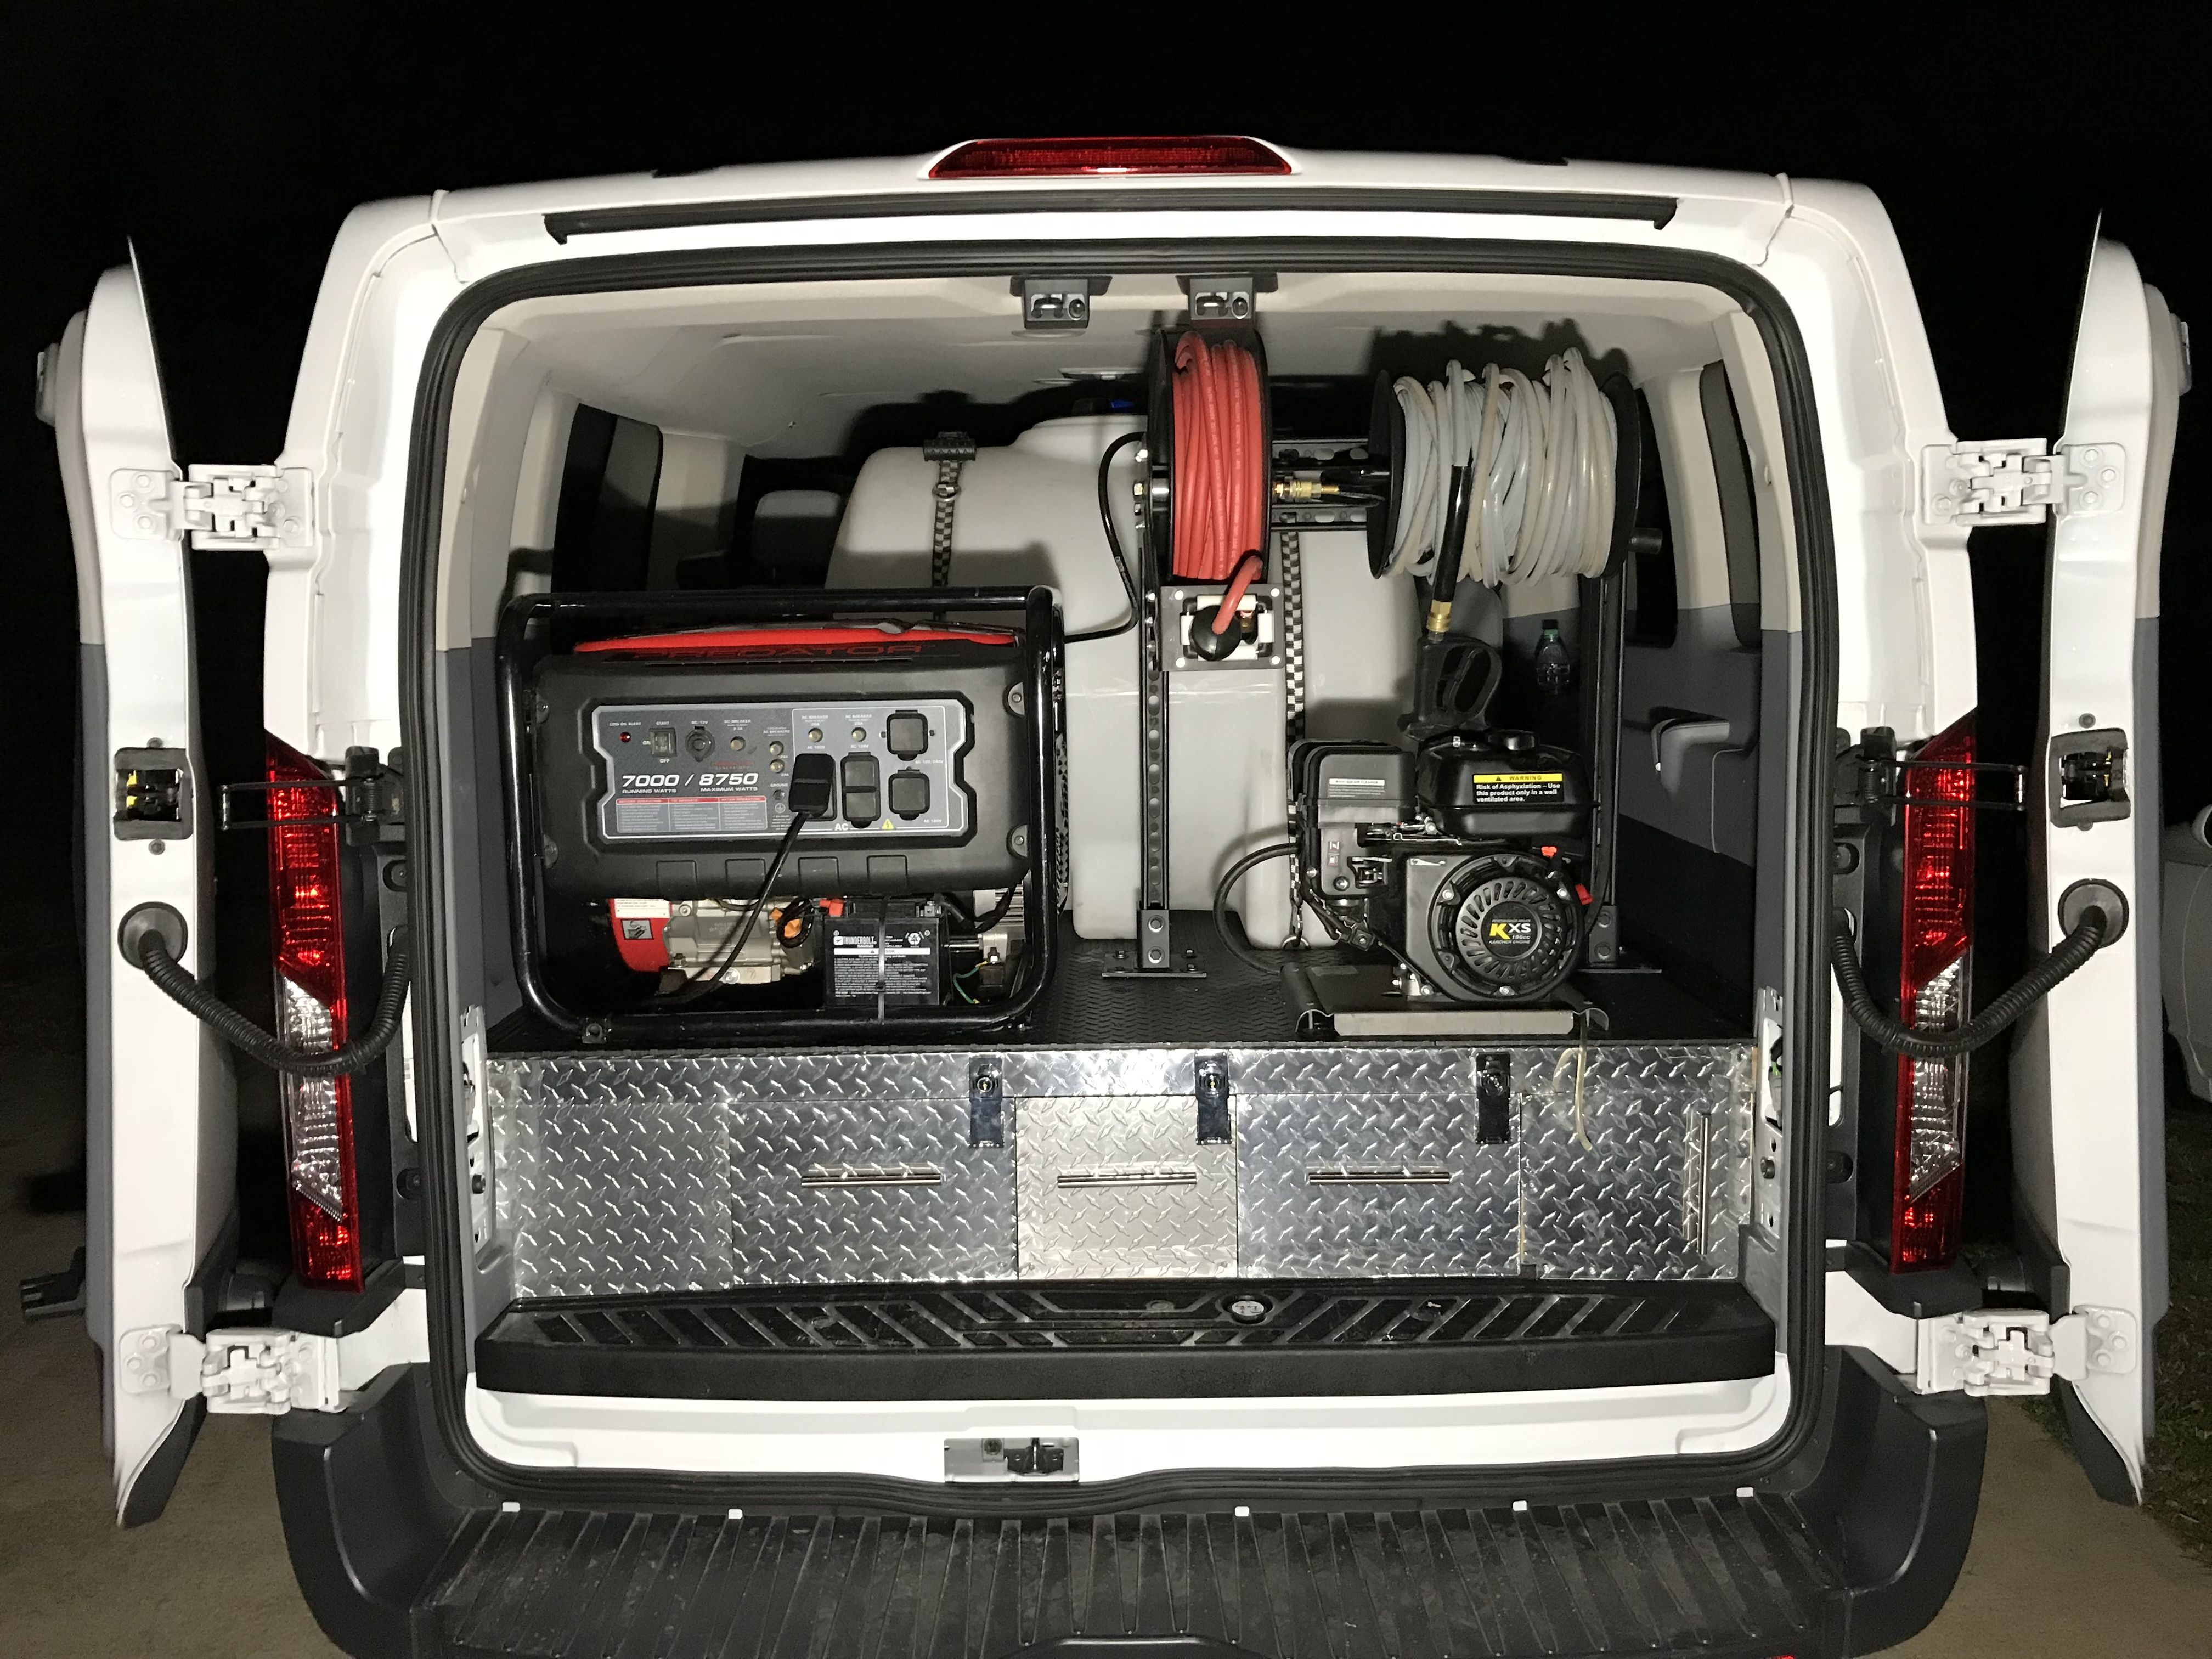 Ralda's Auto Detailing set up Car wash business, Mobile